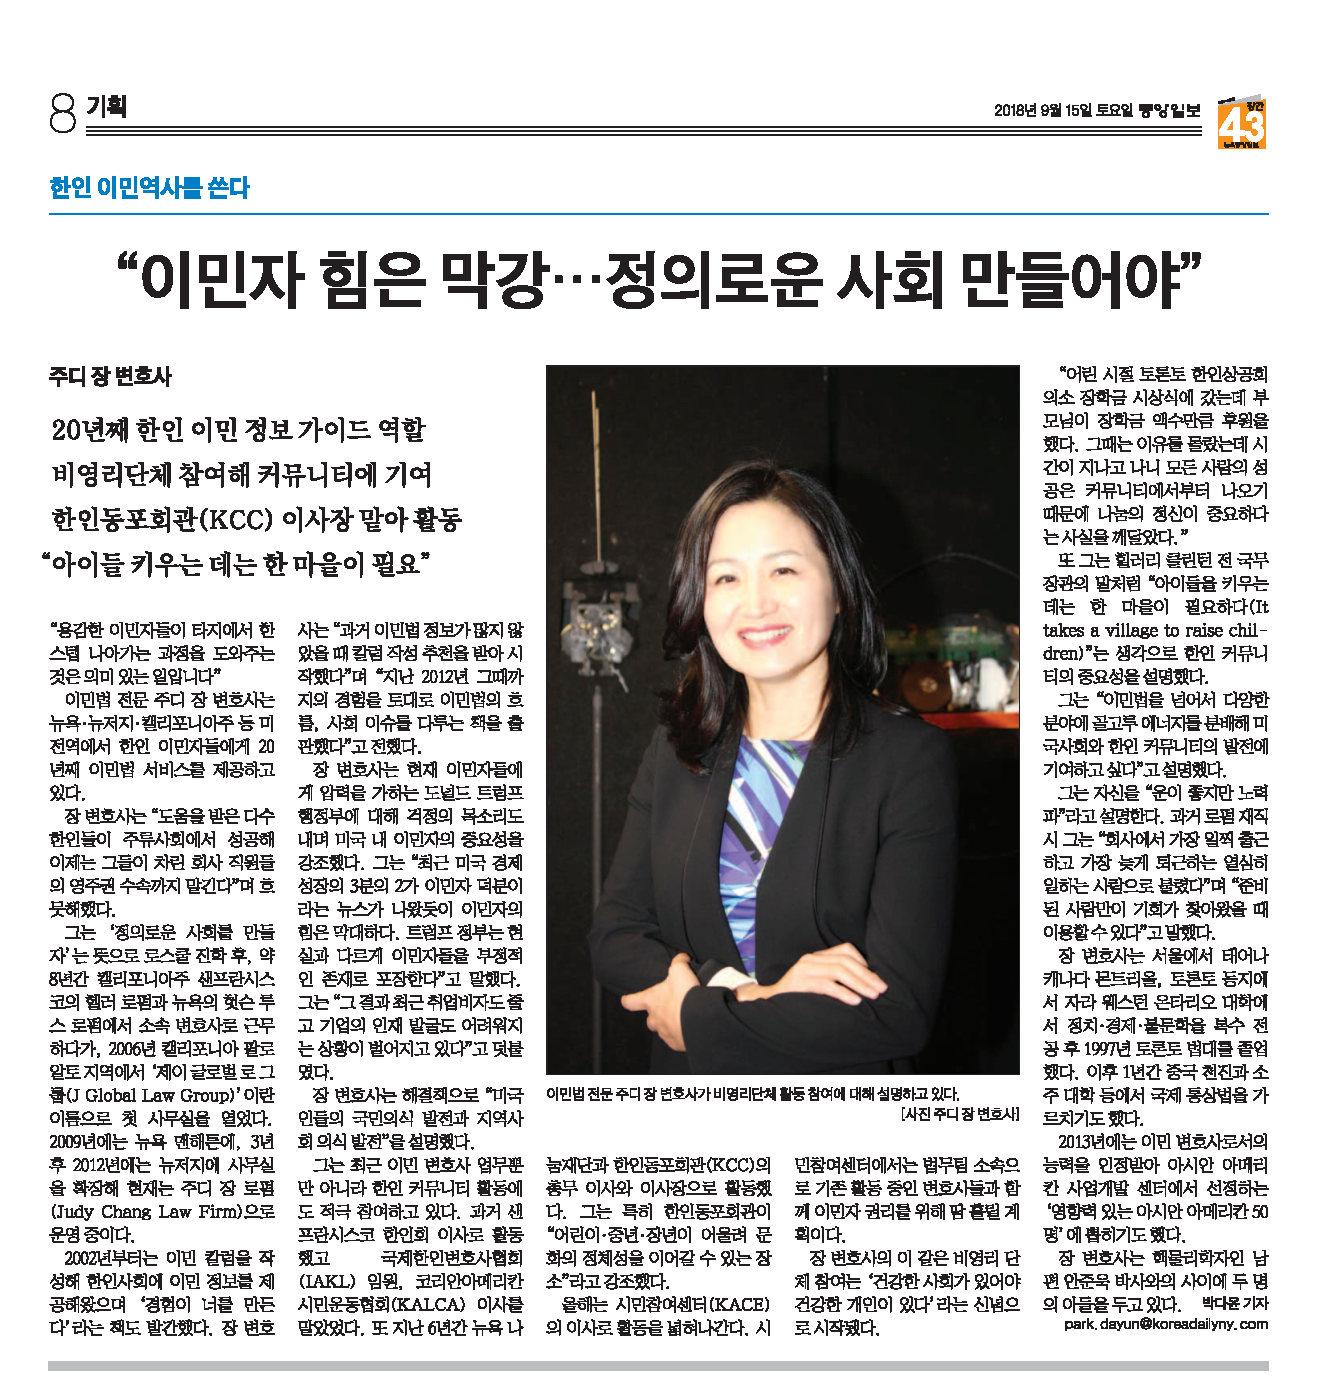 The Korea daily newpaper.20180915.jpg